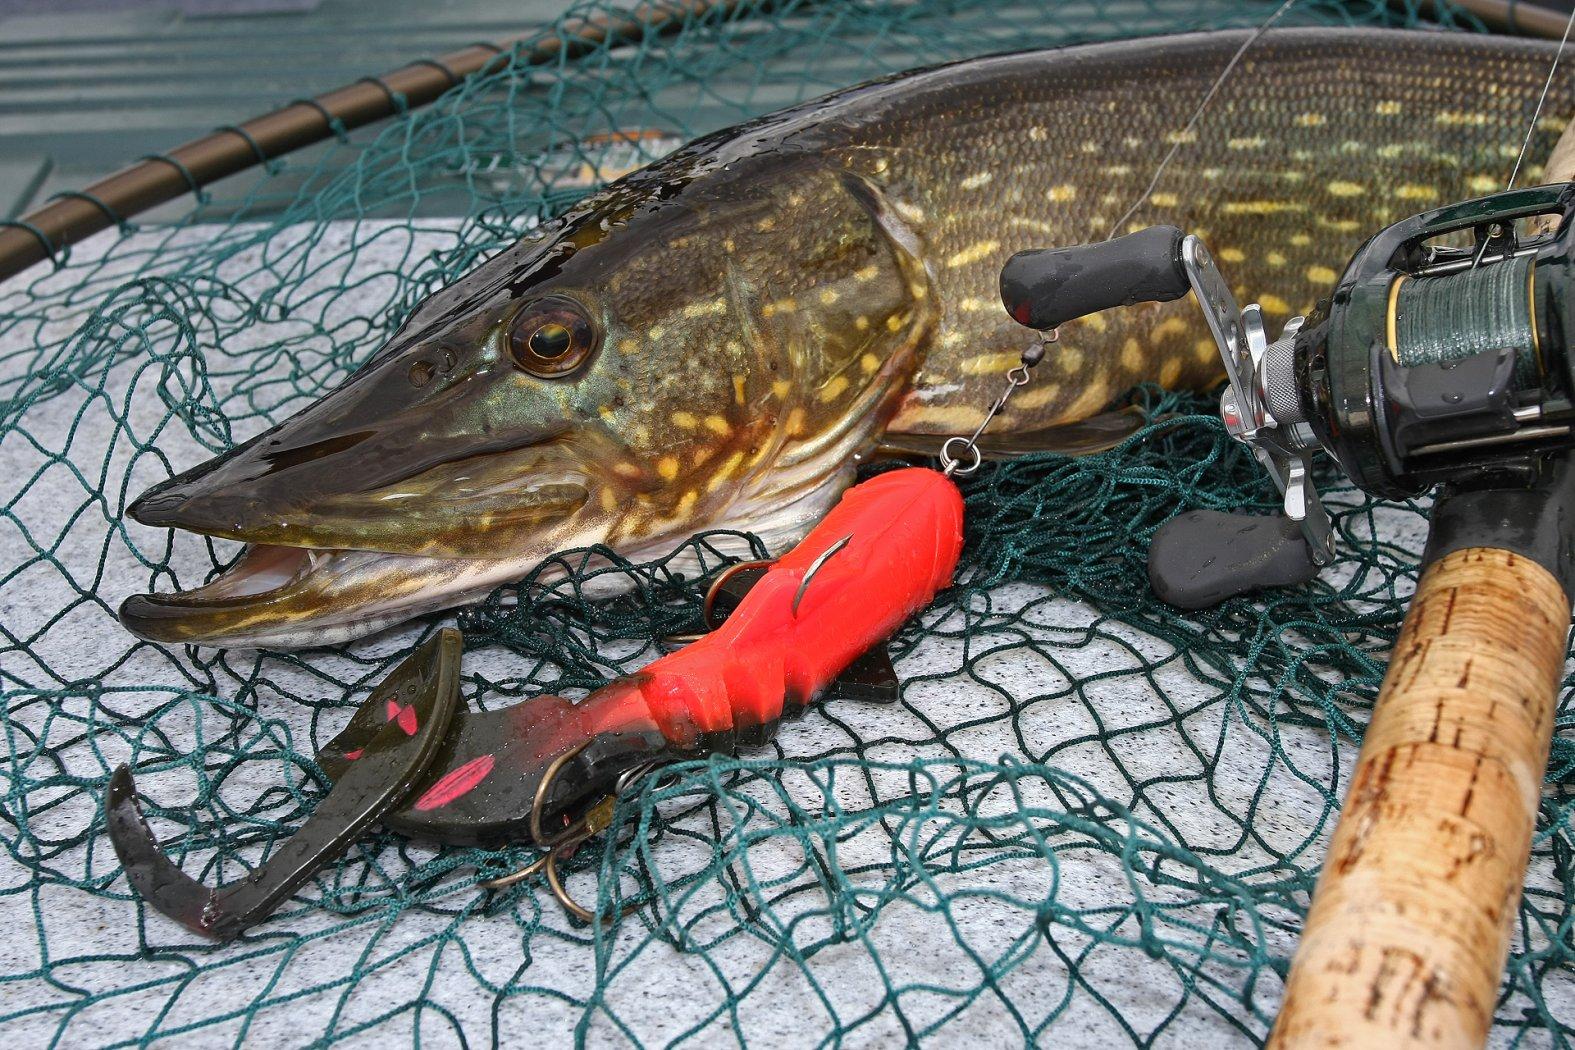 Swimbait angeln auf Hecht